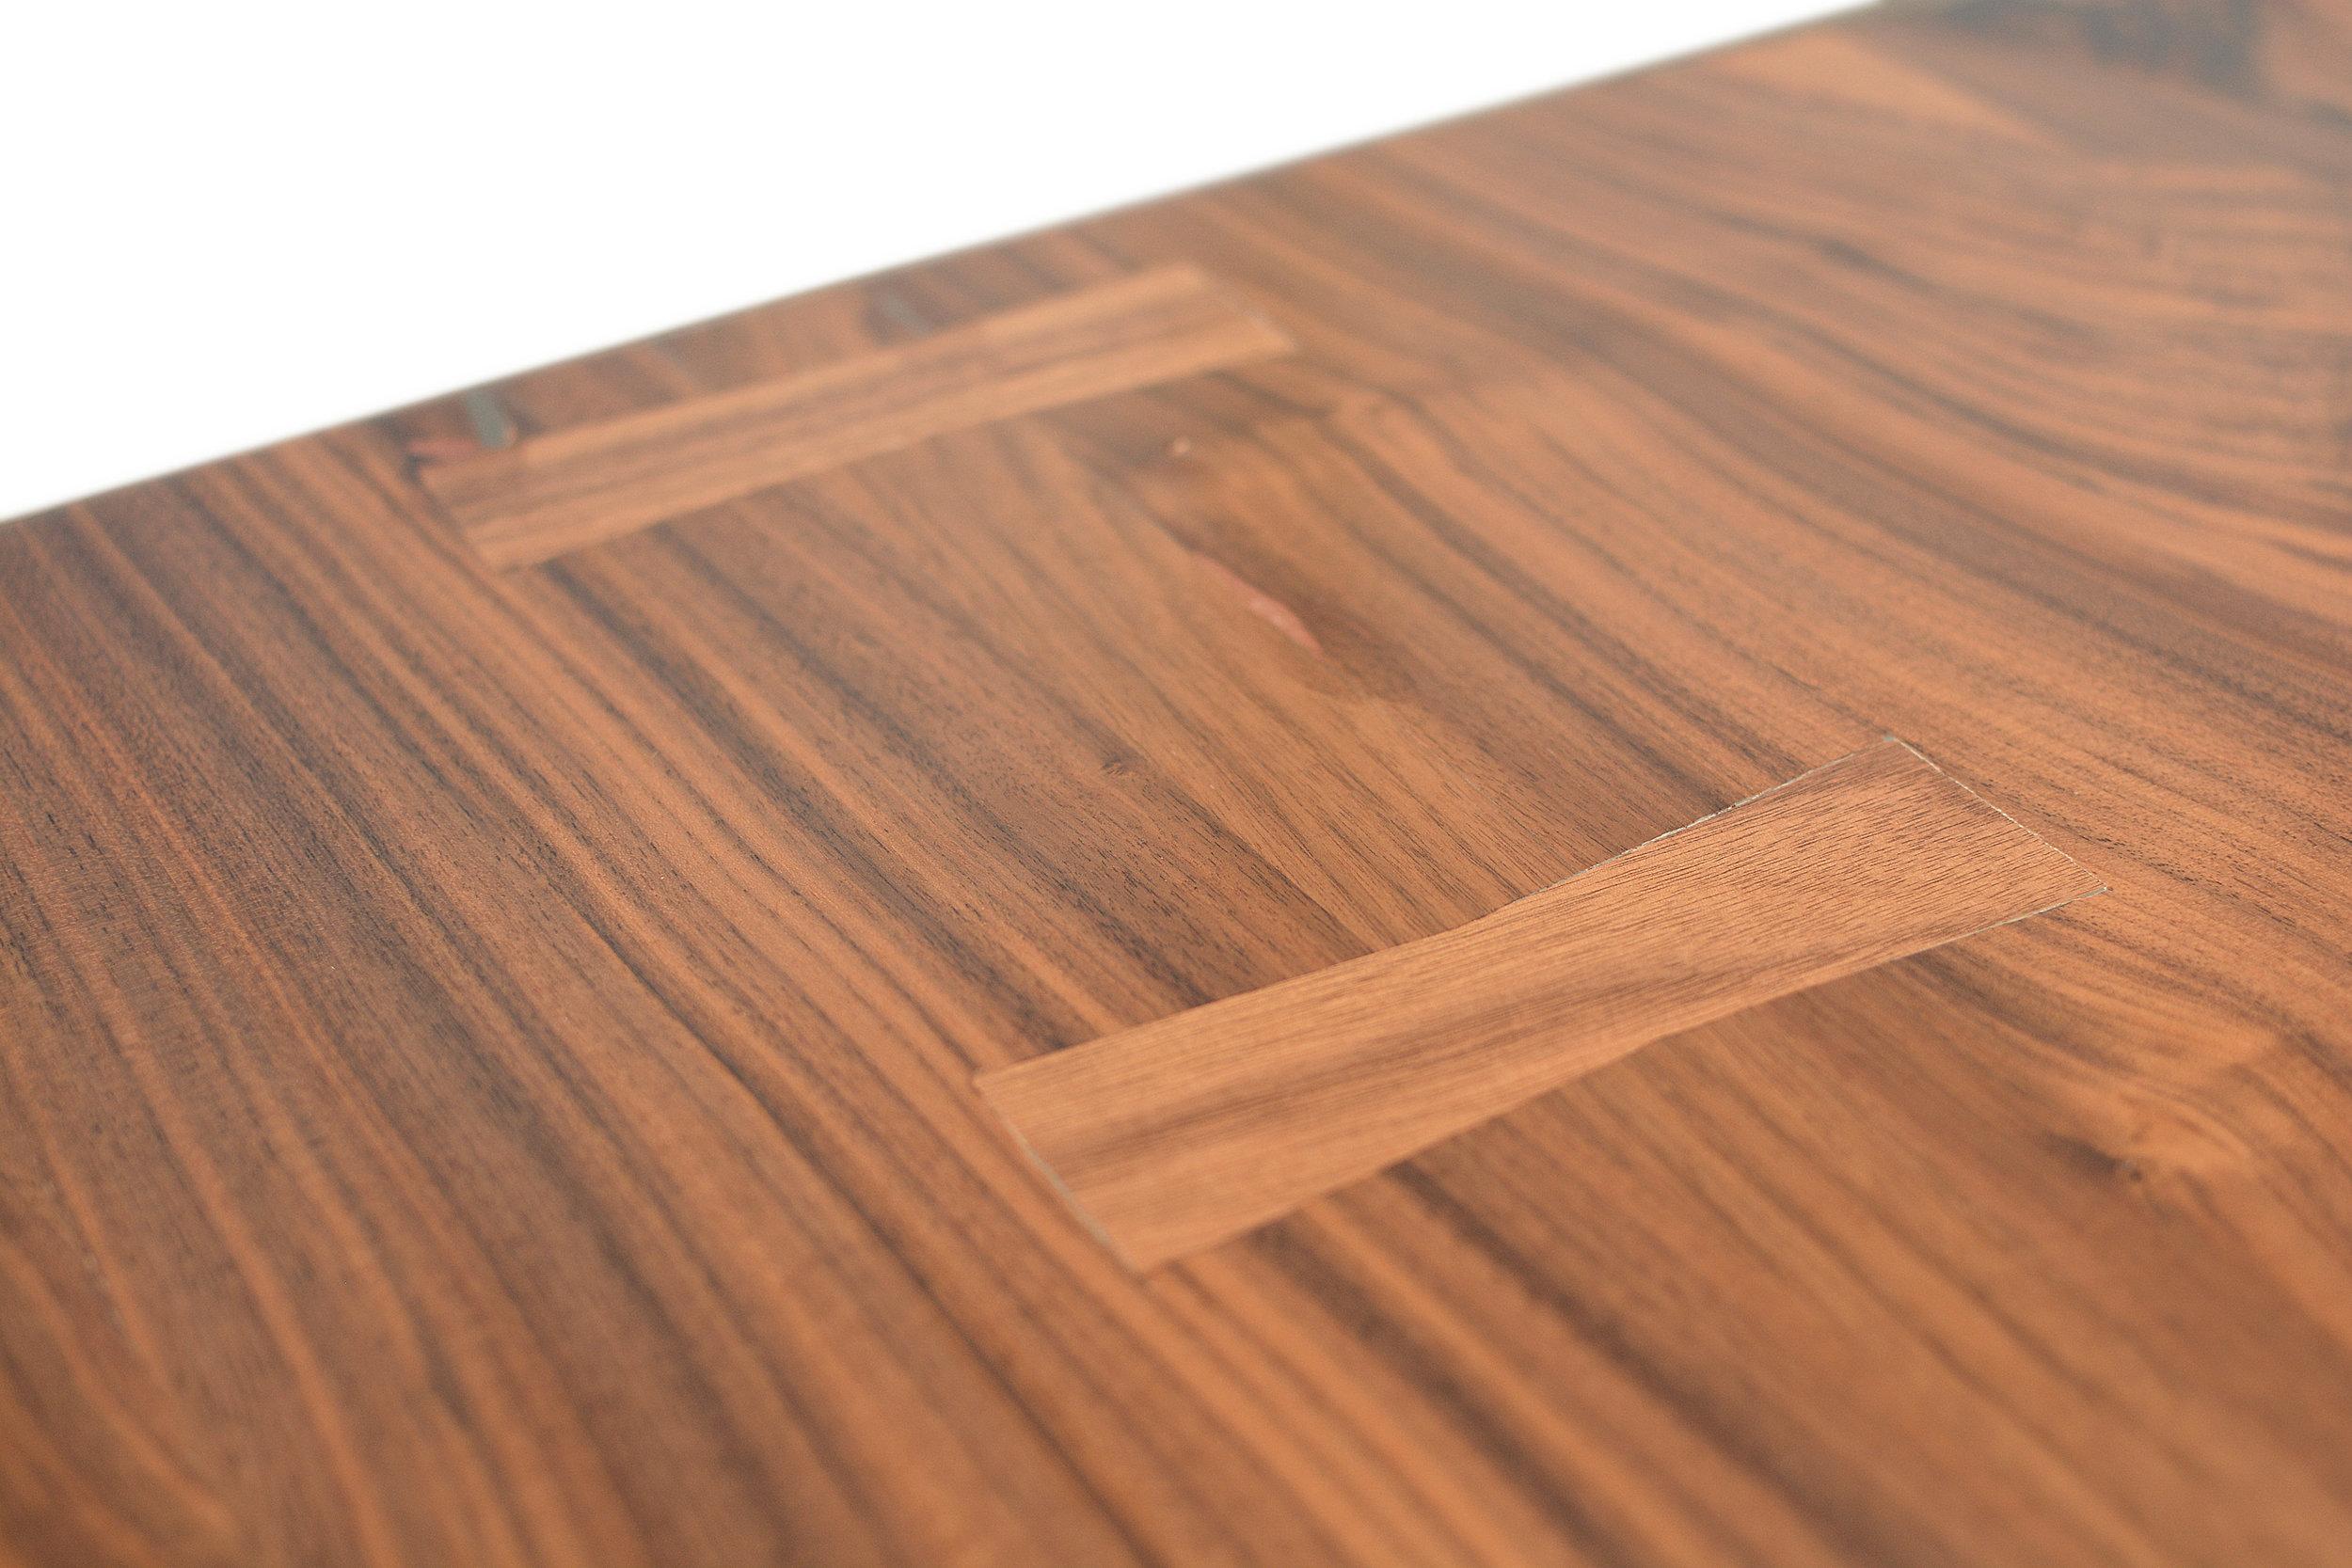 Etz & Steel Hermes Live Edge Walnut Table Close Up 17.JPG